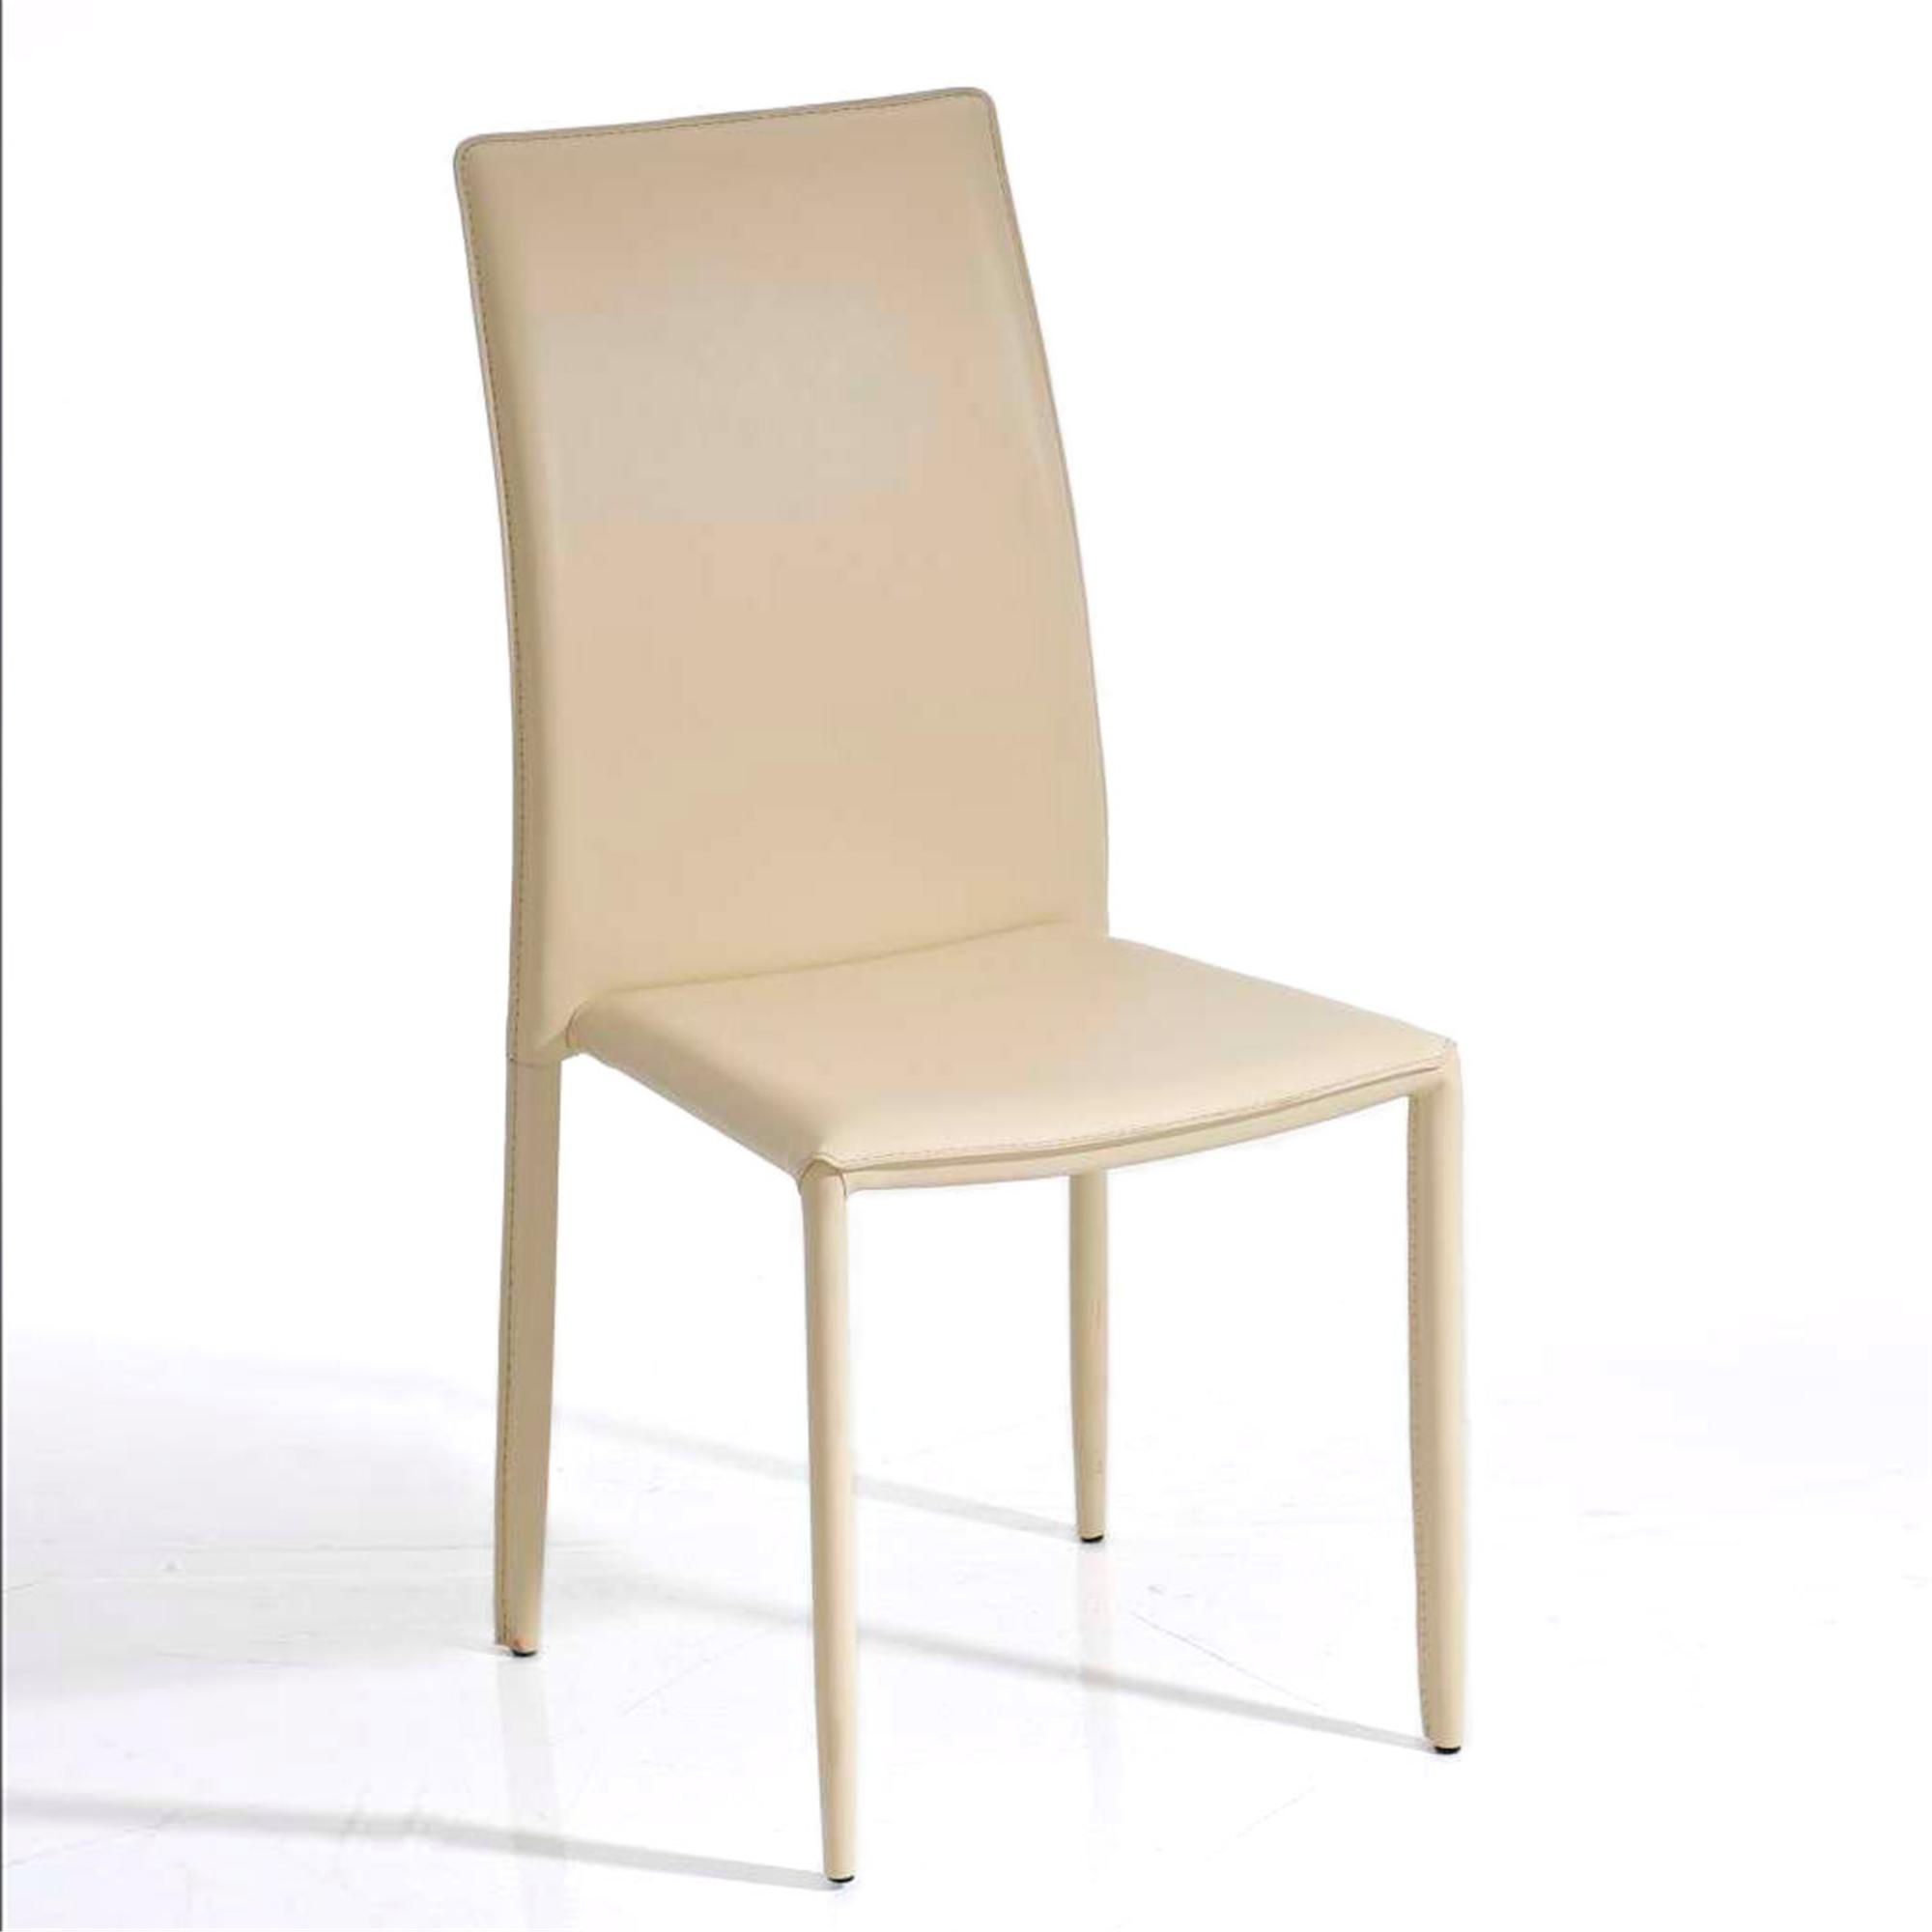 Silla de comedor o cocina alena apilable color crema for Comedor sillas de colores